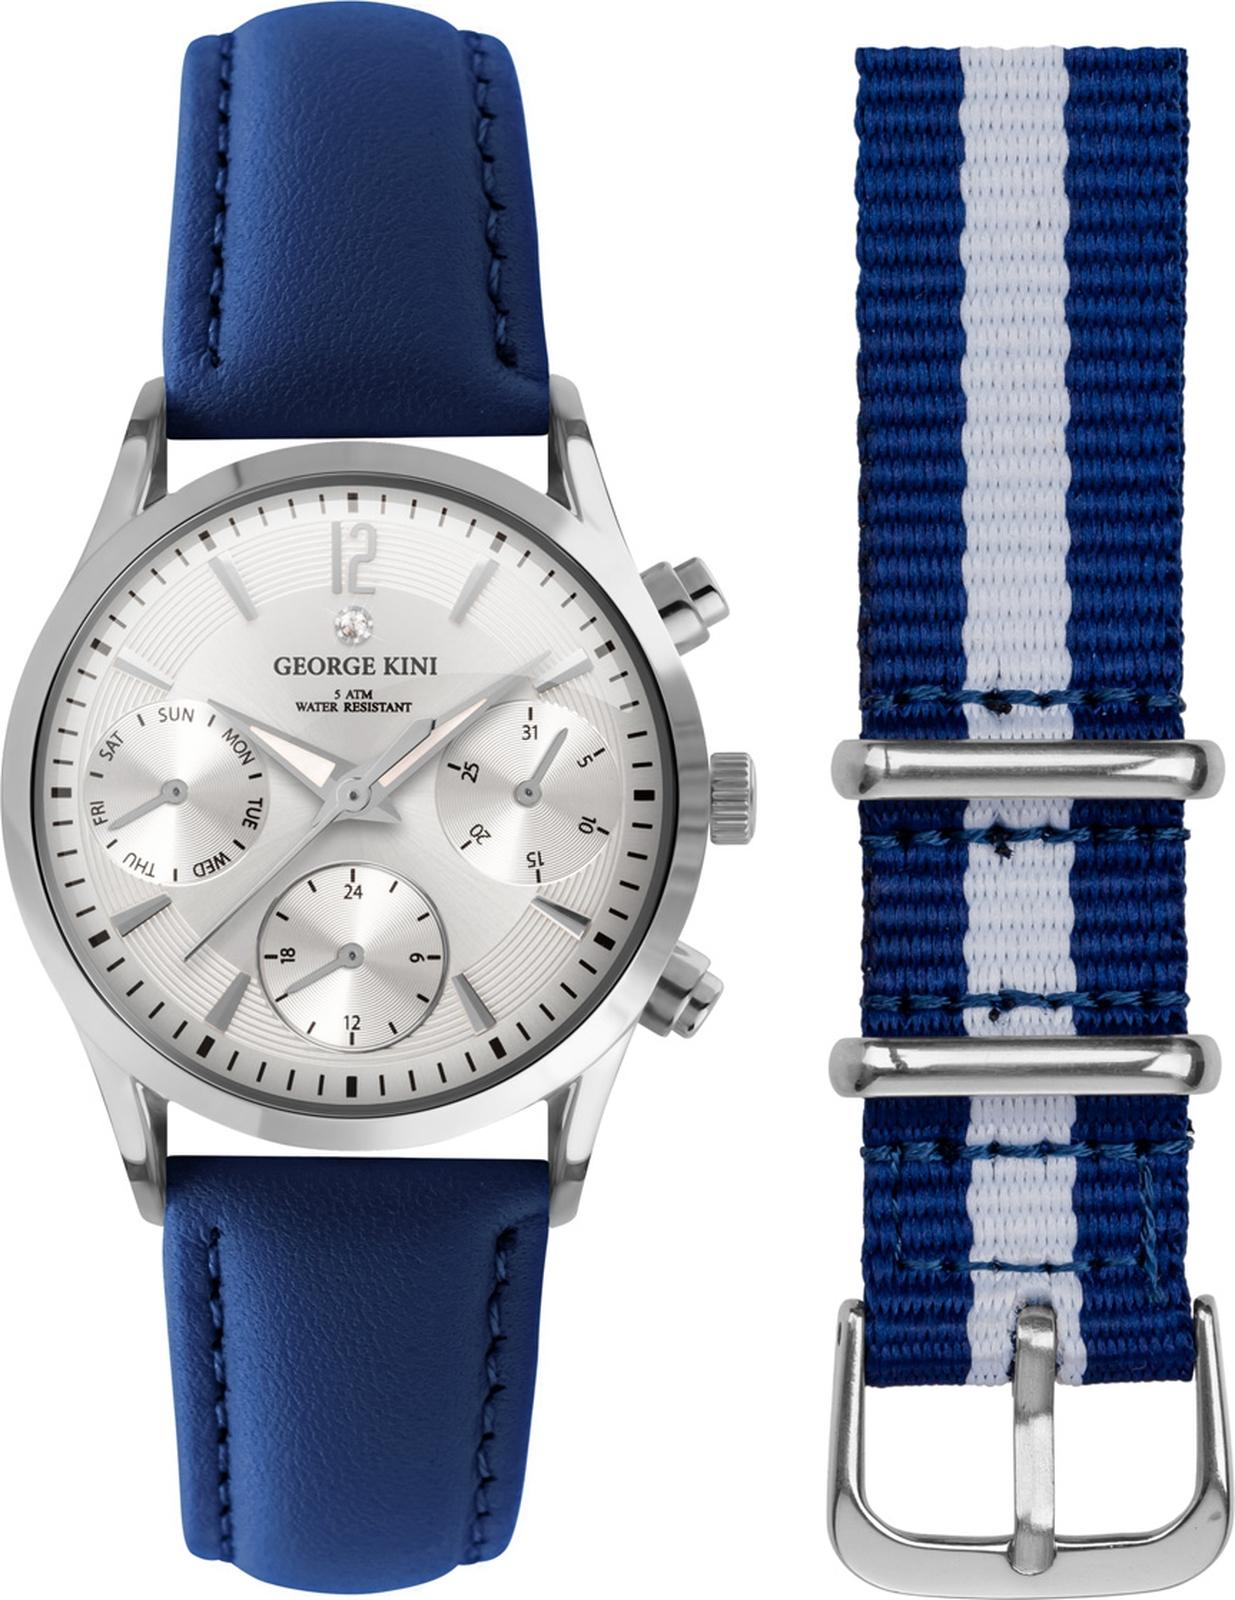 Наручные часы George Kini женские синий